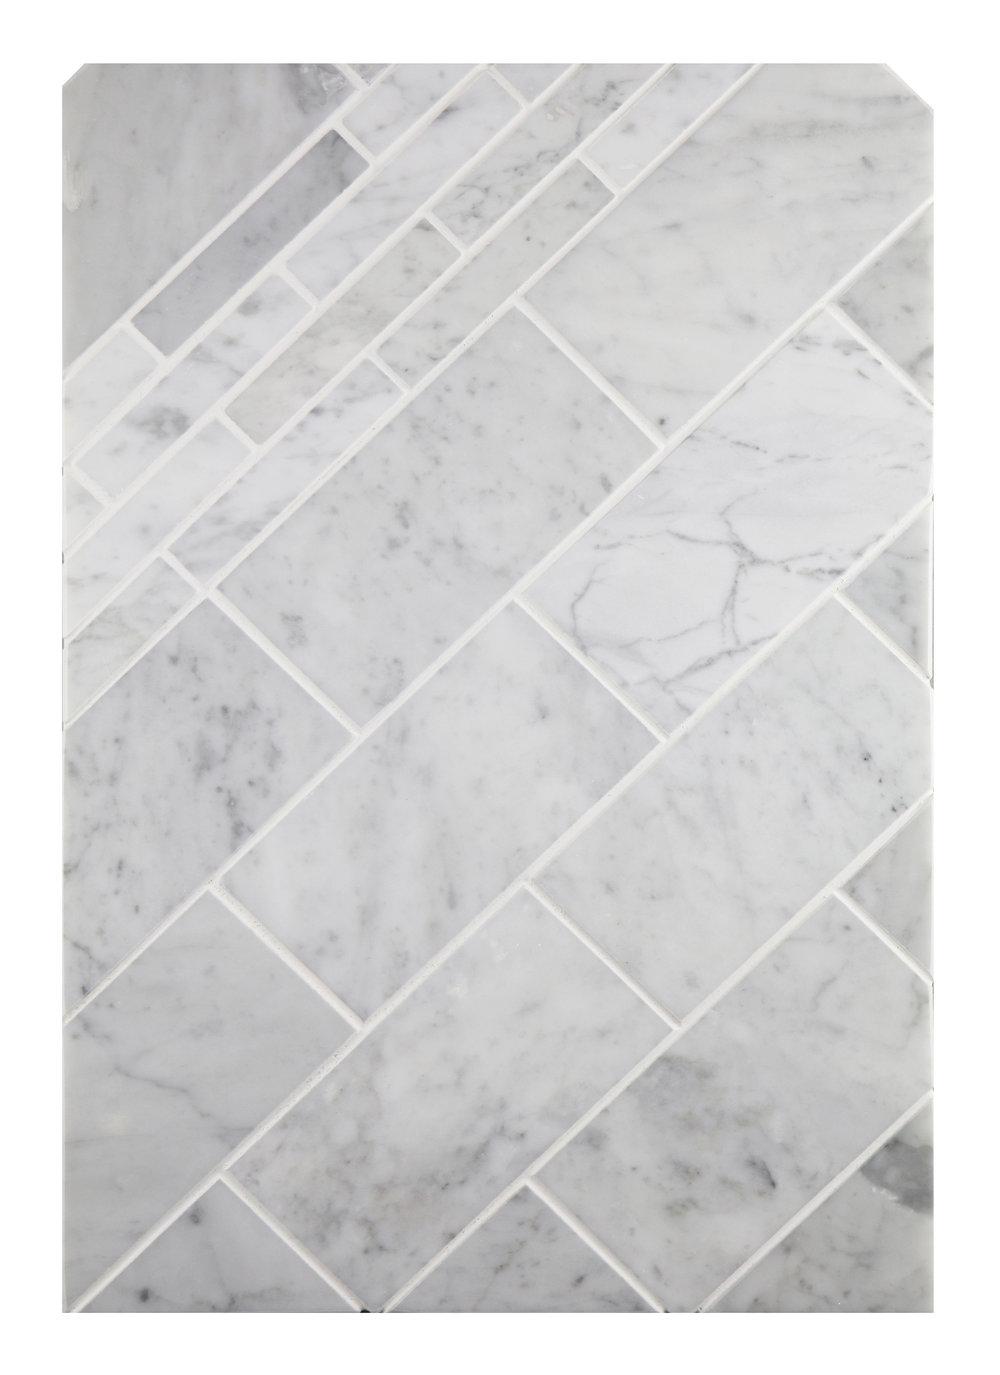 Venatino Carrara 01